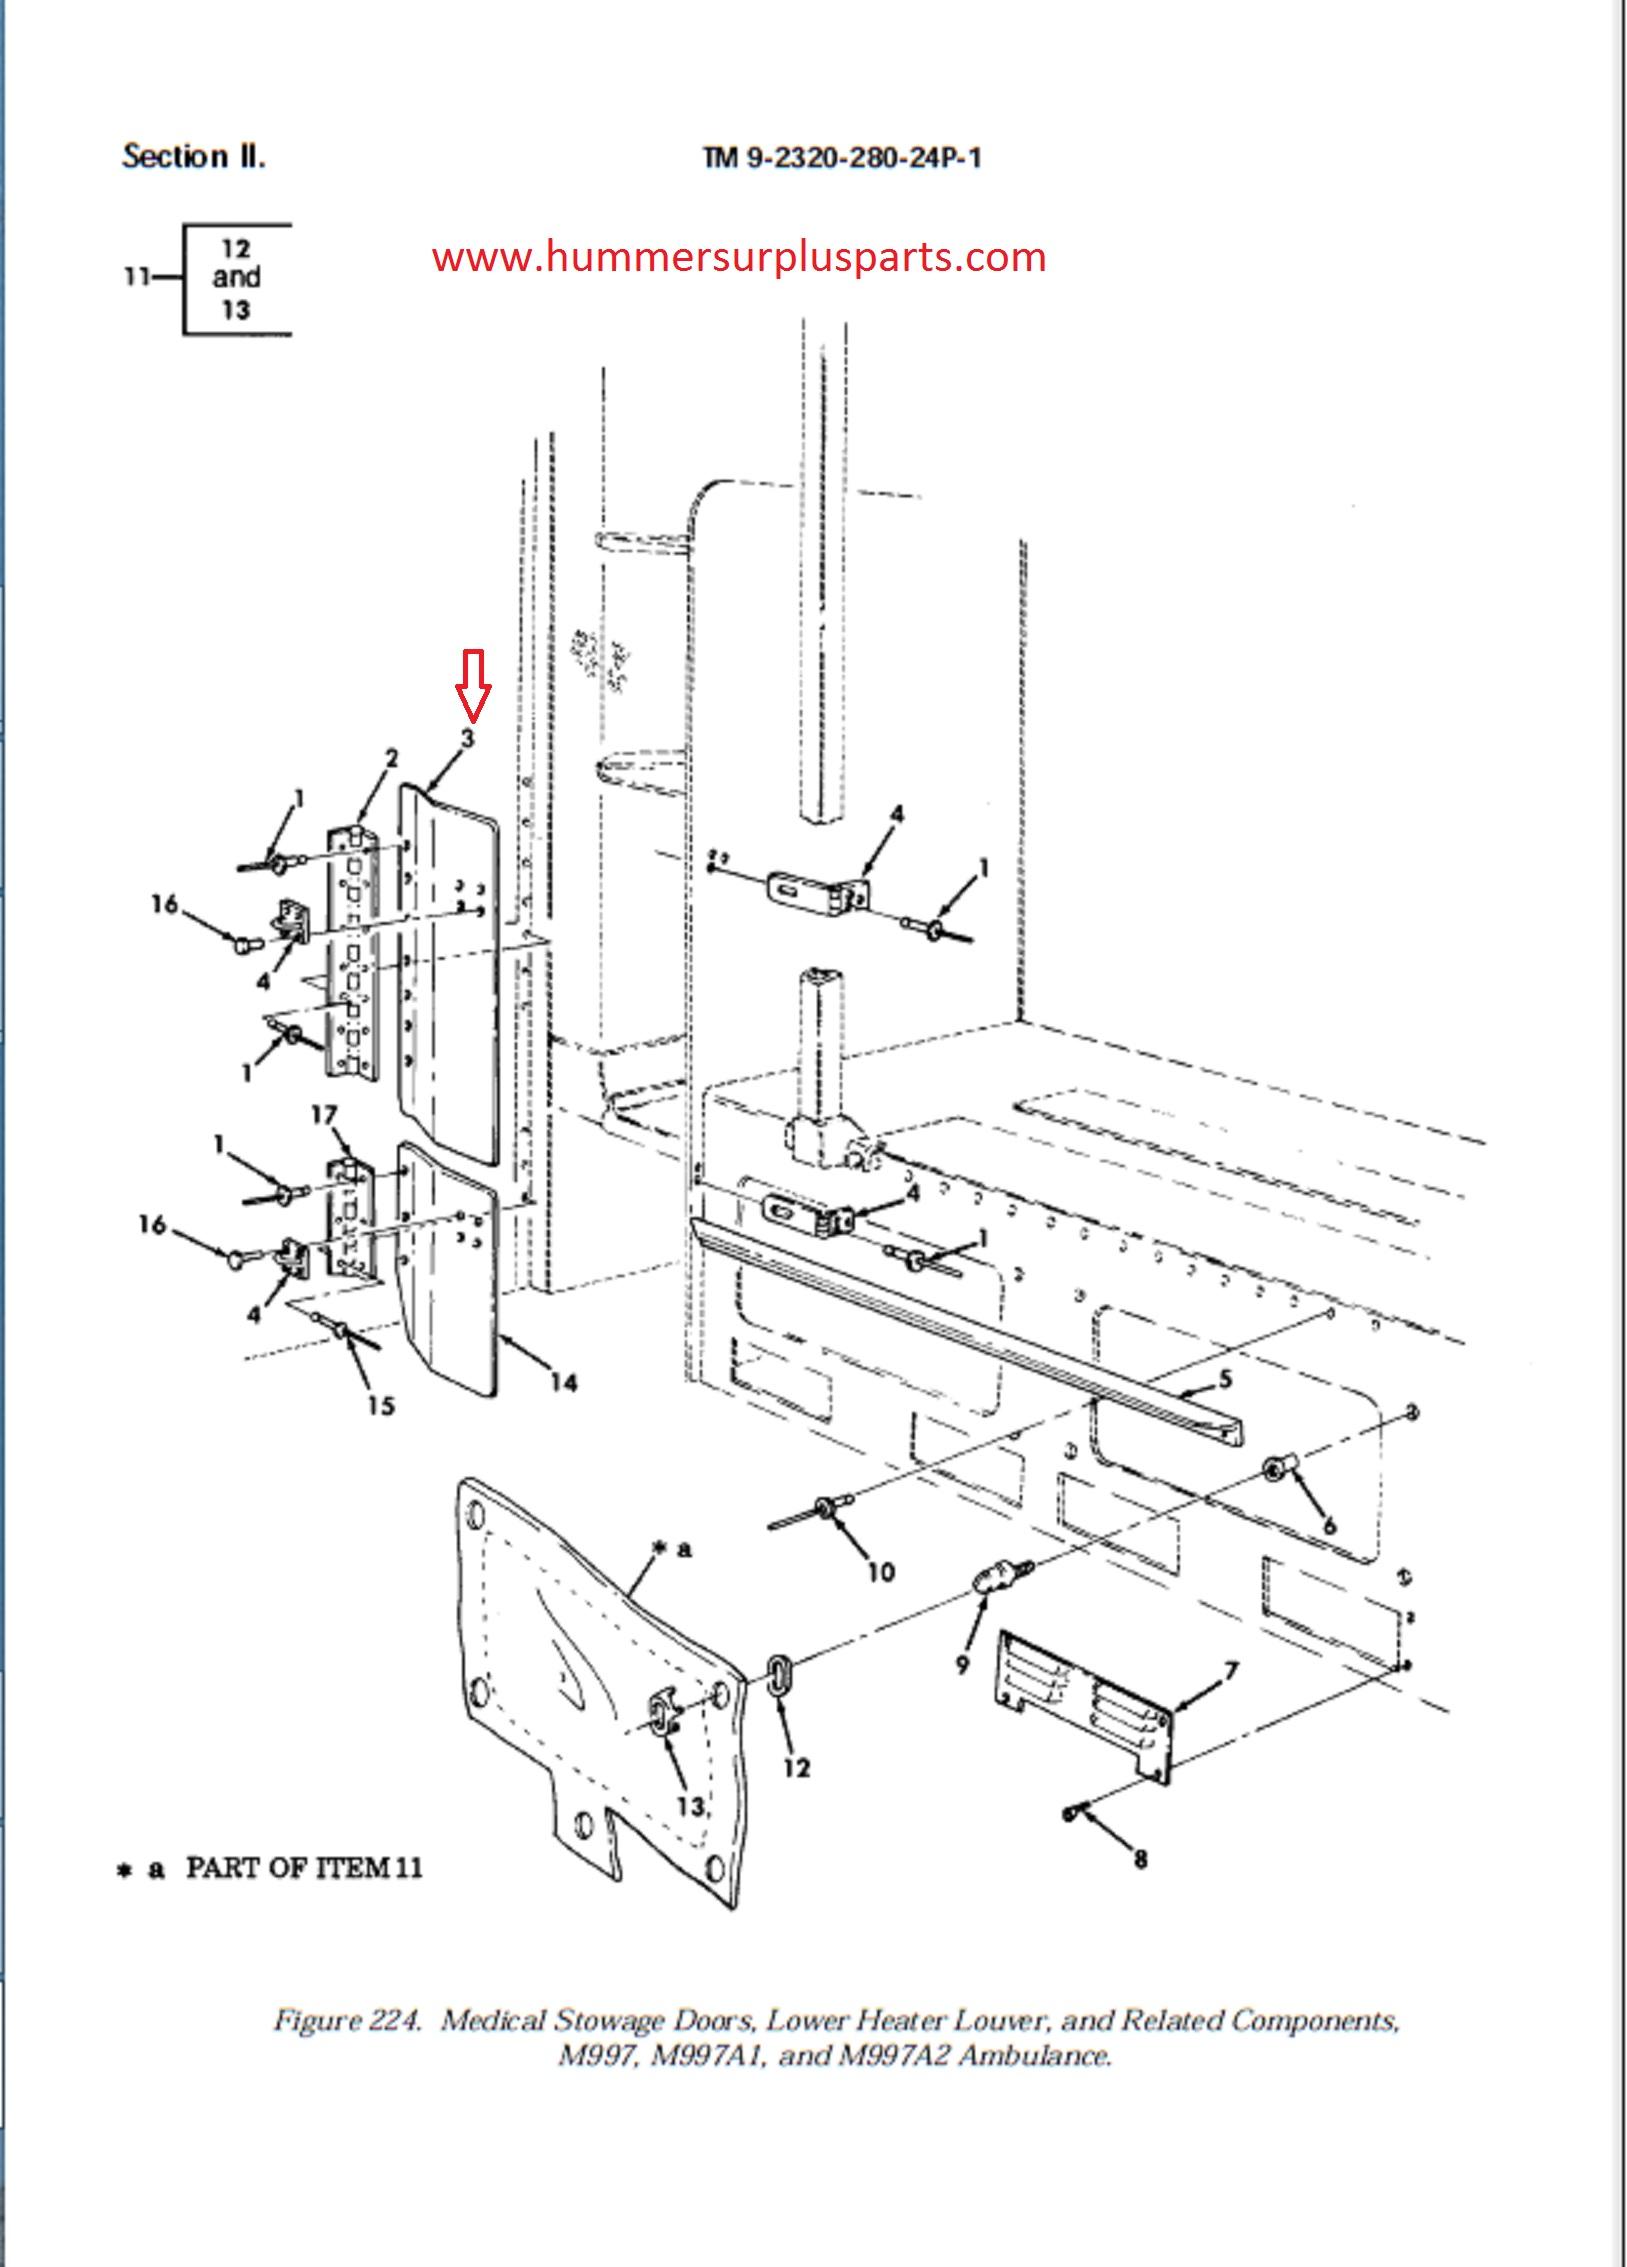 Hmmwv Insulation Diagram Diy Enthusiasts Wiring Diagrams Schematic Medical Stowage Door 12341120g1 12341120 5589900 2510 01 272 0536 Rh Hummersurplusparts Com Cargo Load Planning